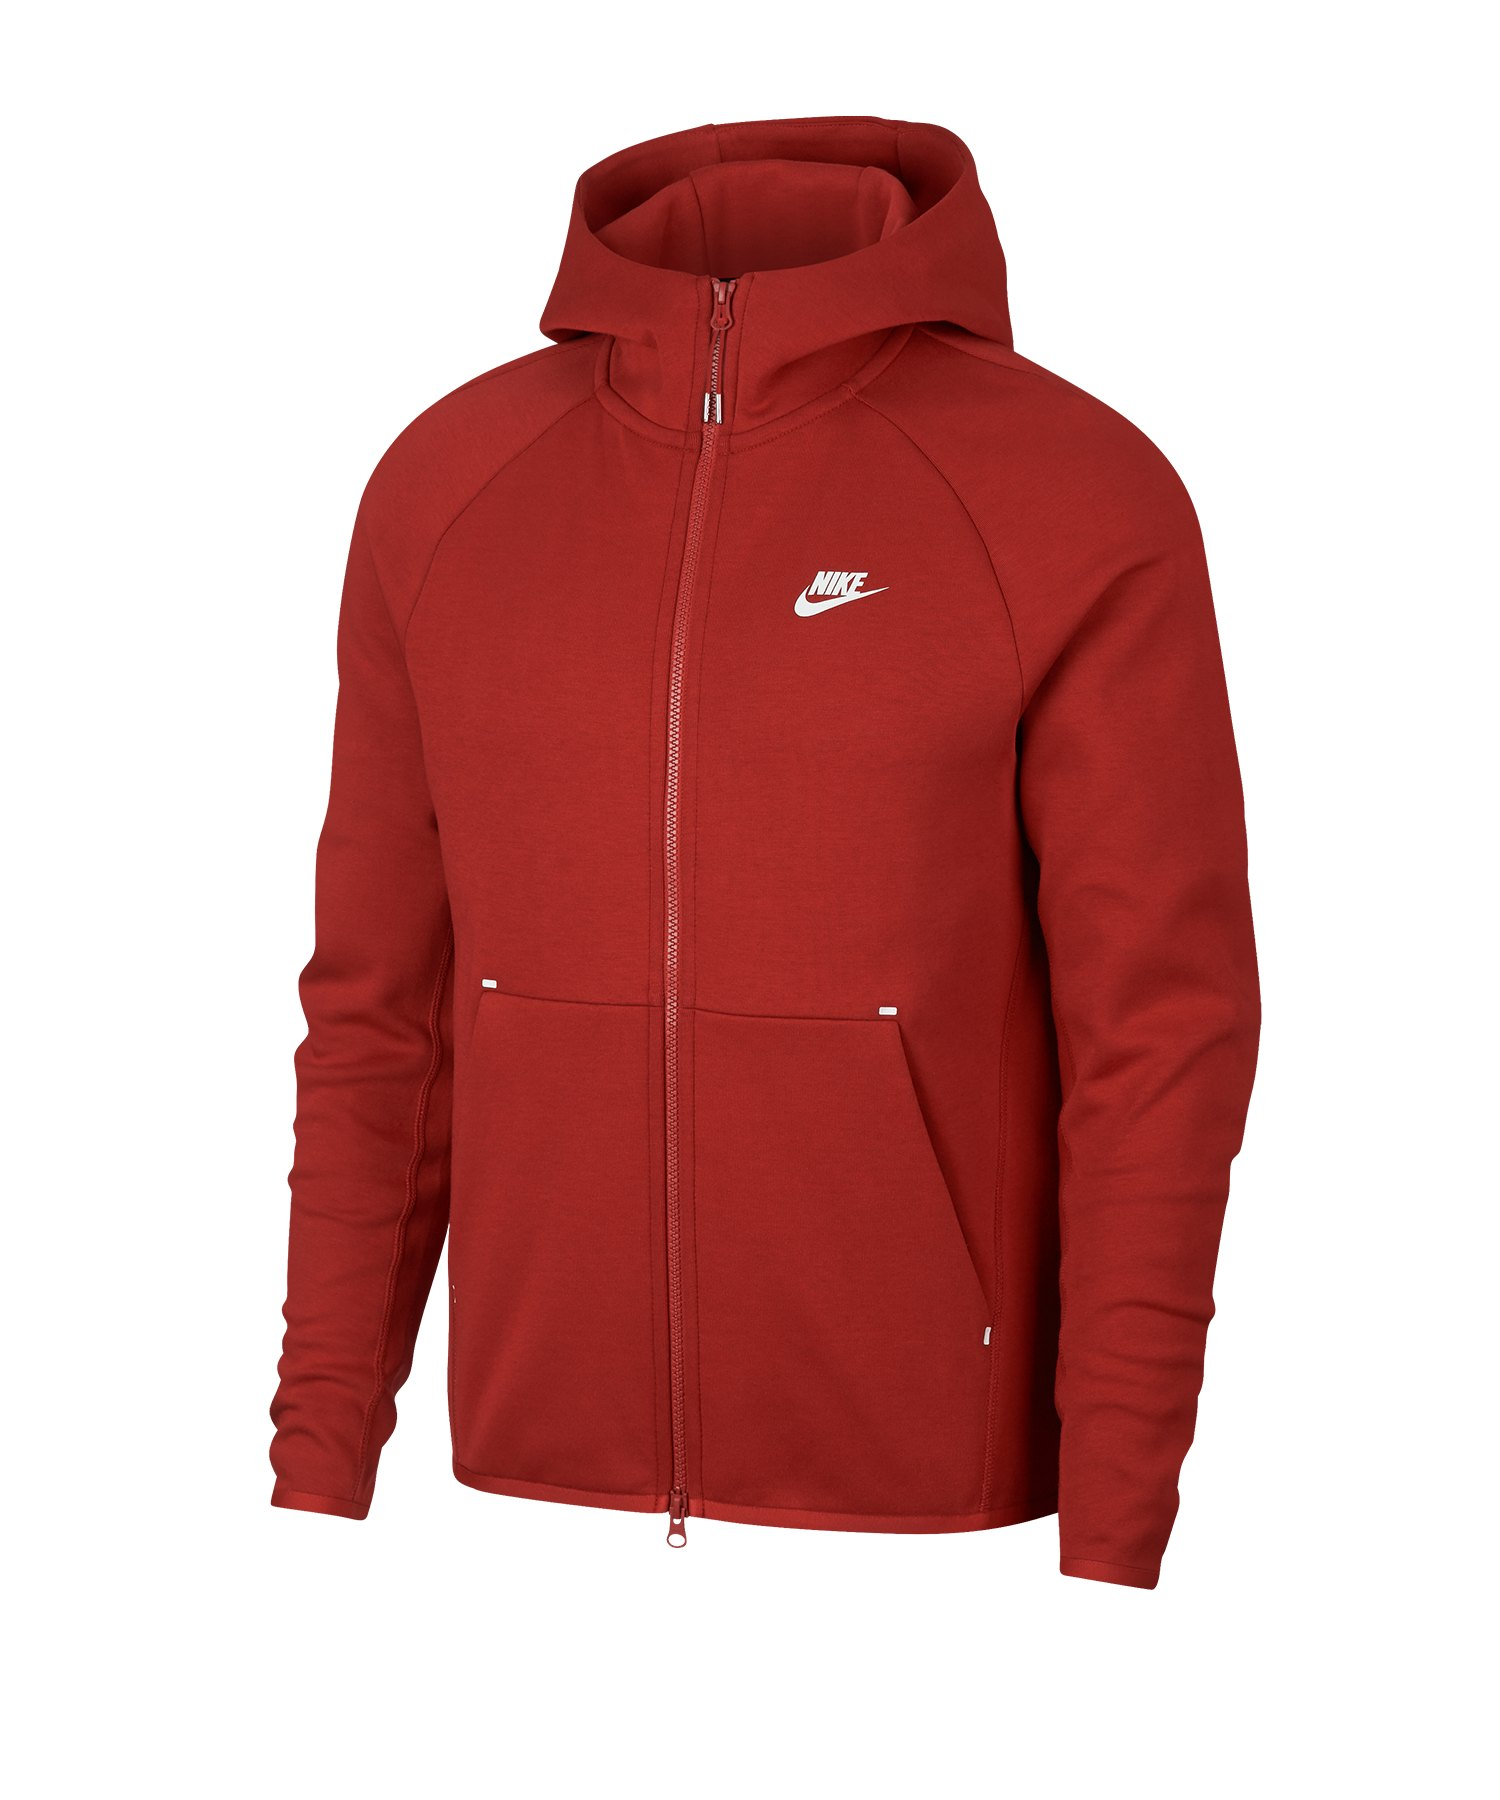 Nike Tech Fleece Kapuzenjacke Rot F622 - rot